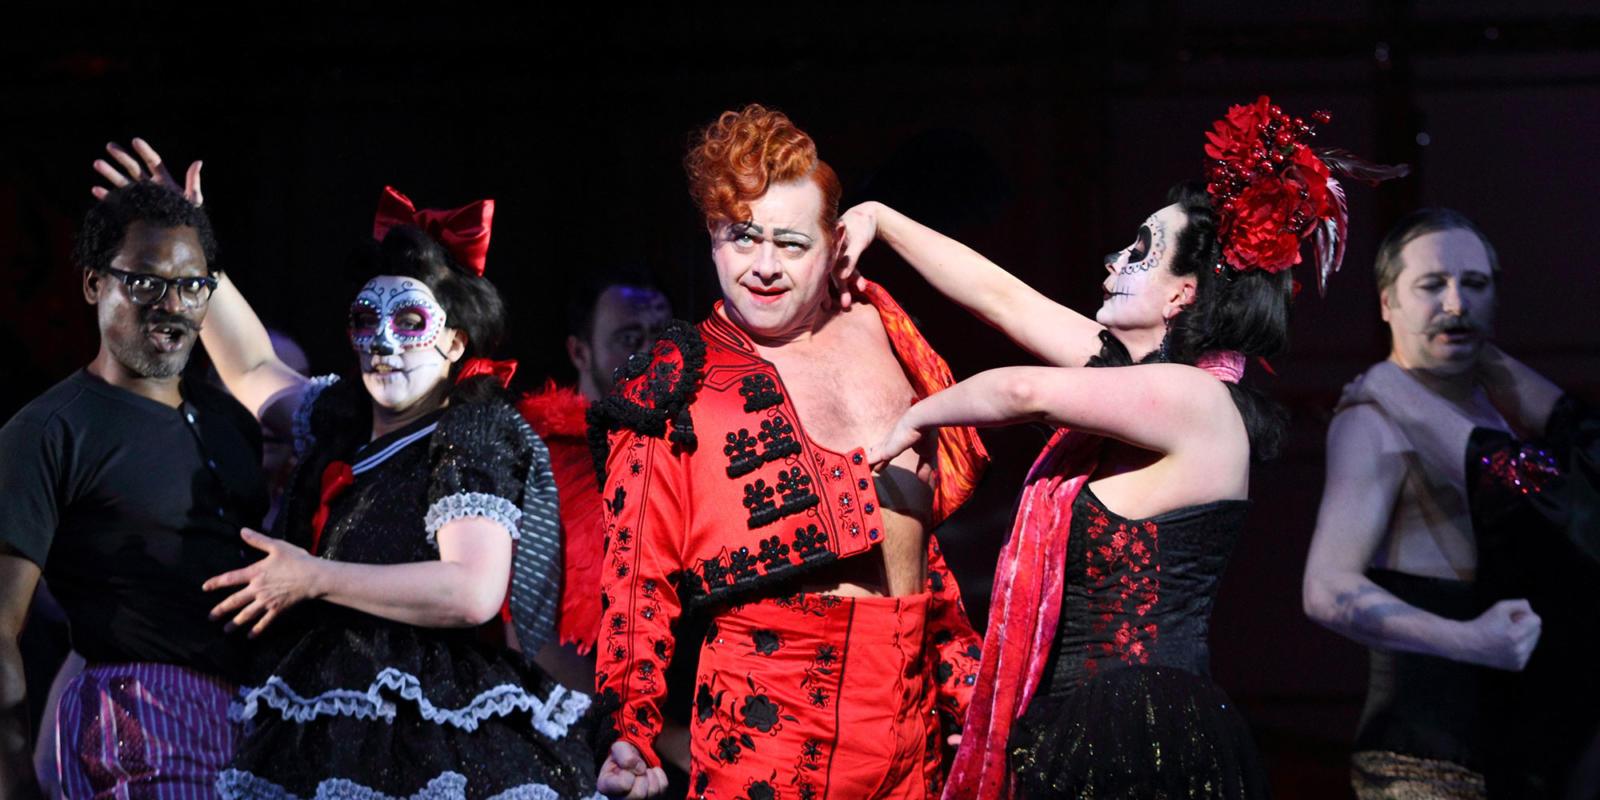 ENO Traviata Aled Hall, Heather Shipp and members of the ENO Chorus (c) Catherine Ashmore